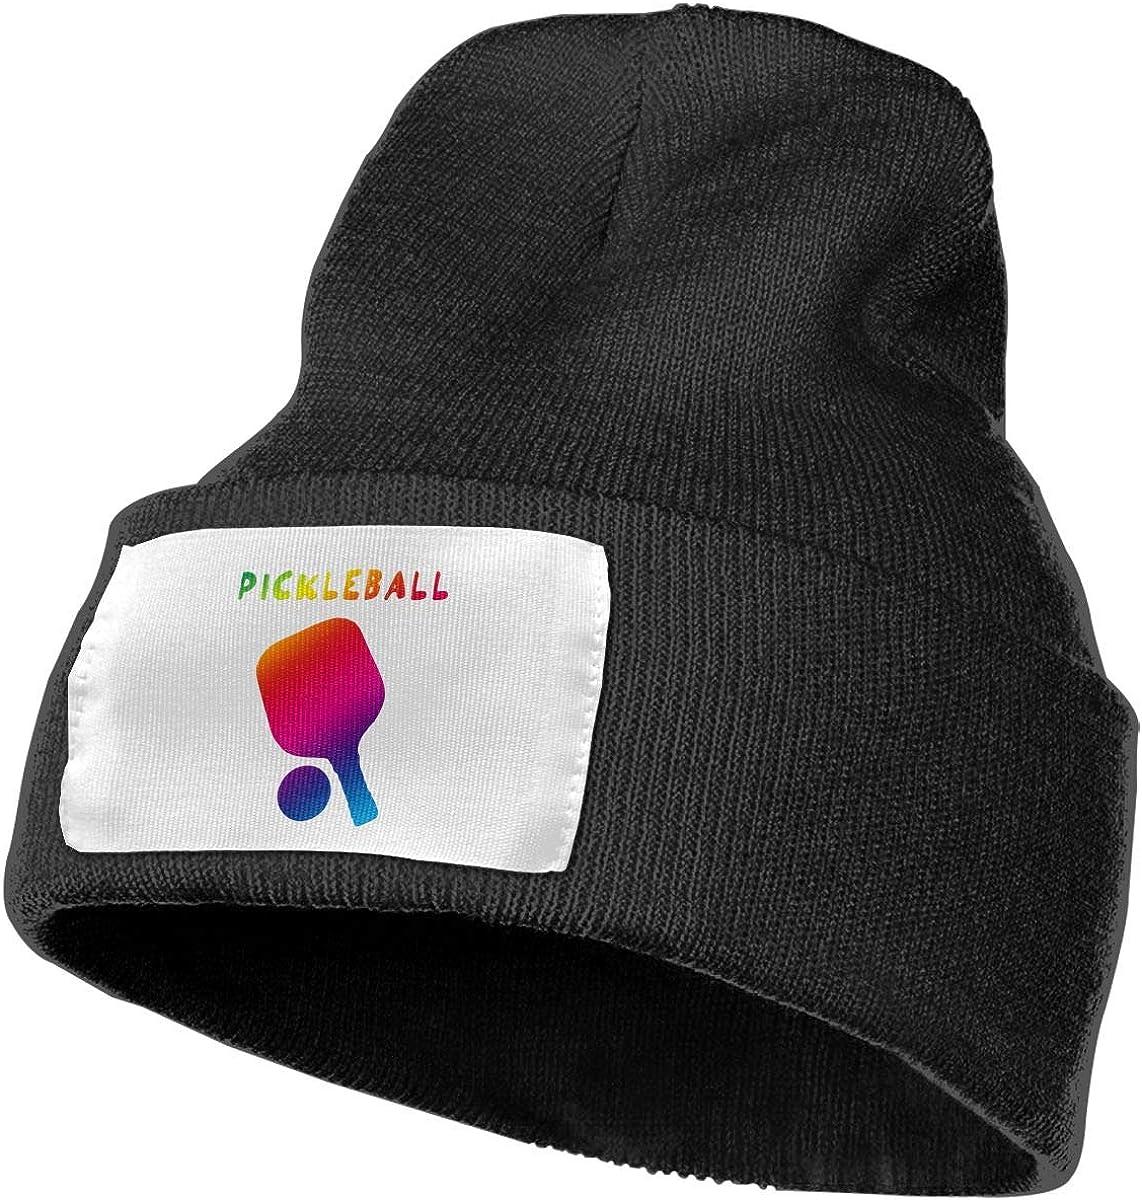 3208cx41 Pickleball Wool Hat Women//Men Soft Stretch Knit Beanie Hat Winter Warm Skull Cap